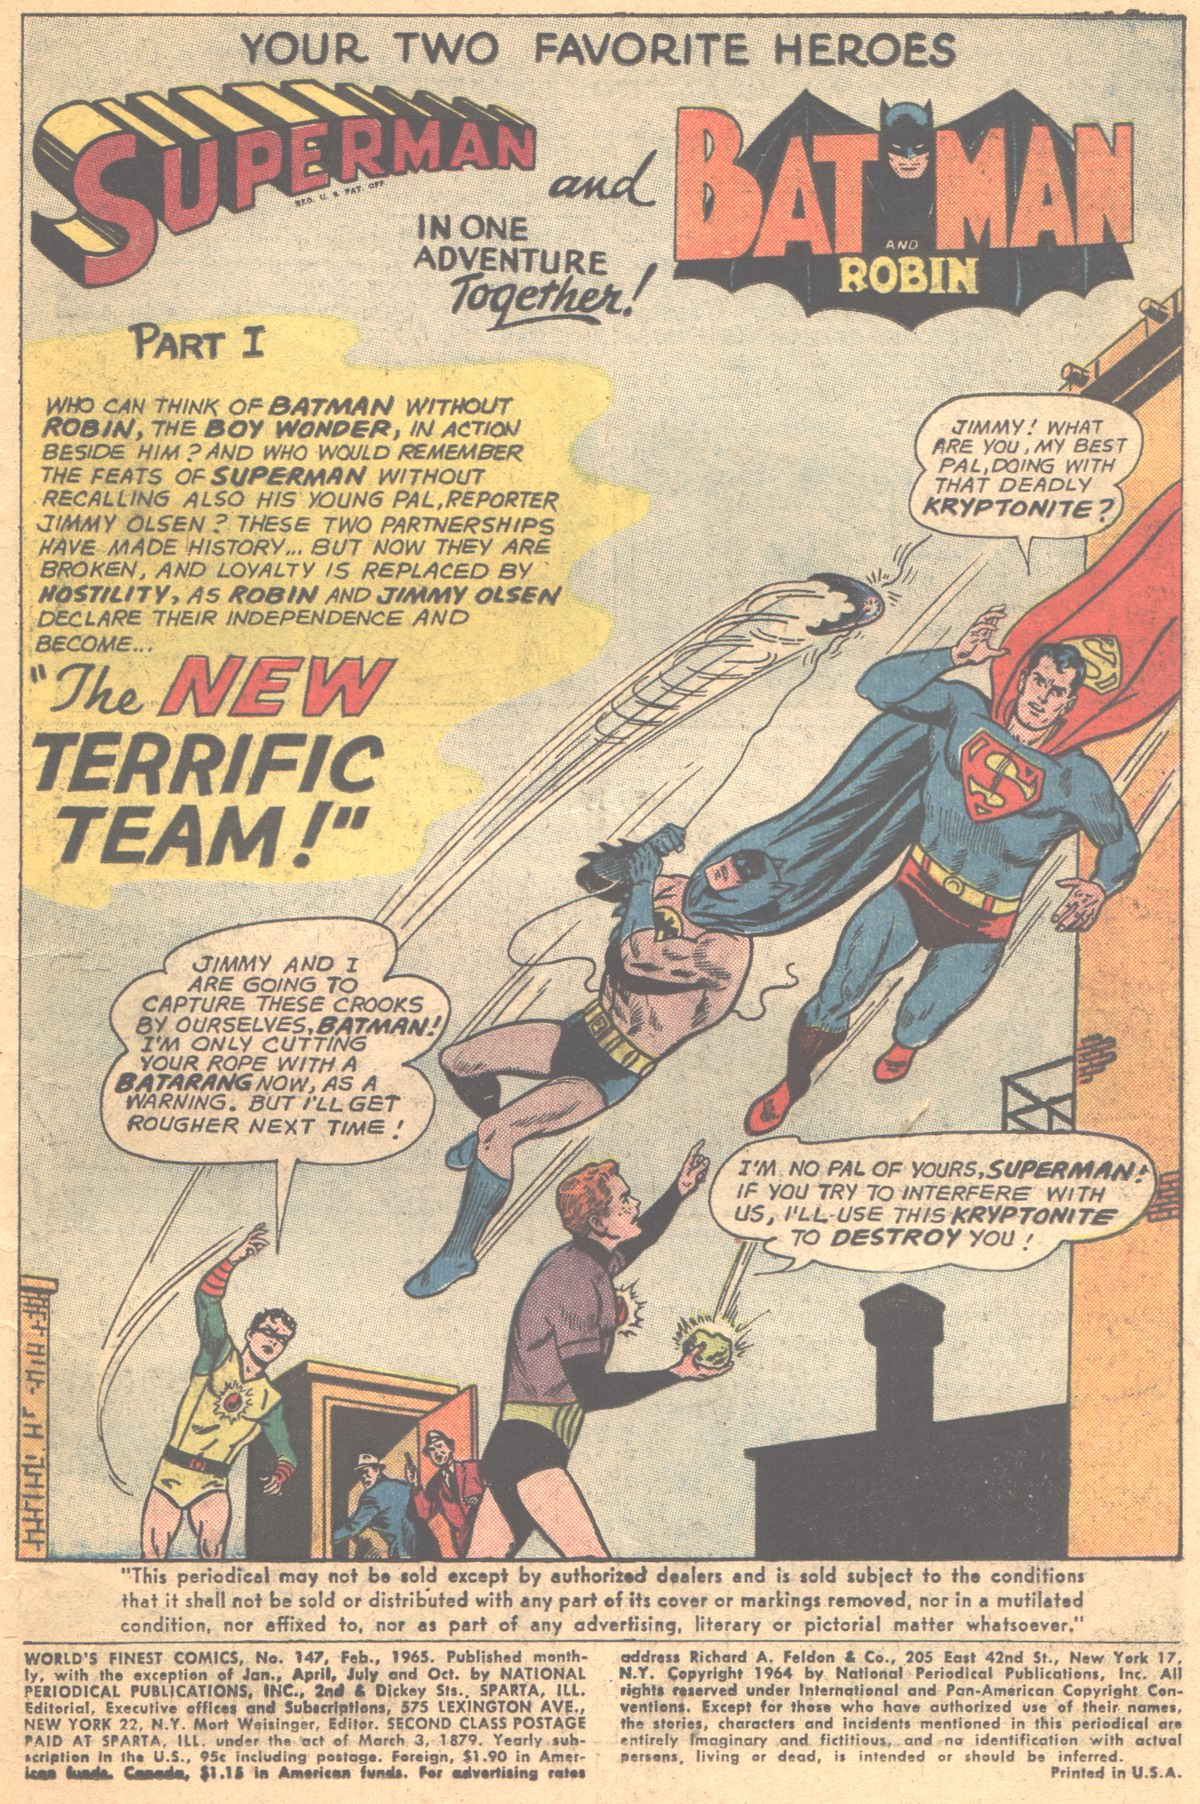 Read online World's Finest Comics comic -  Issue #147 - 3